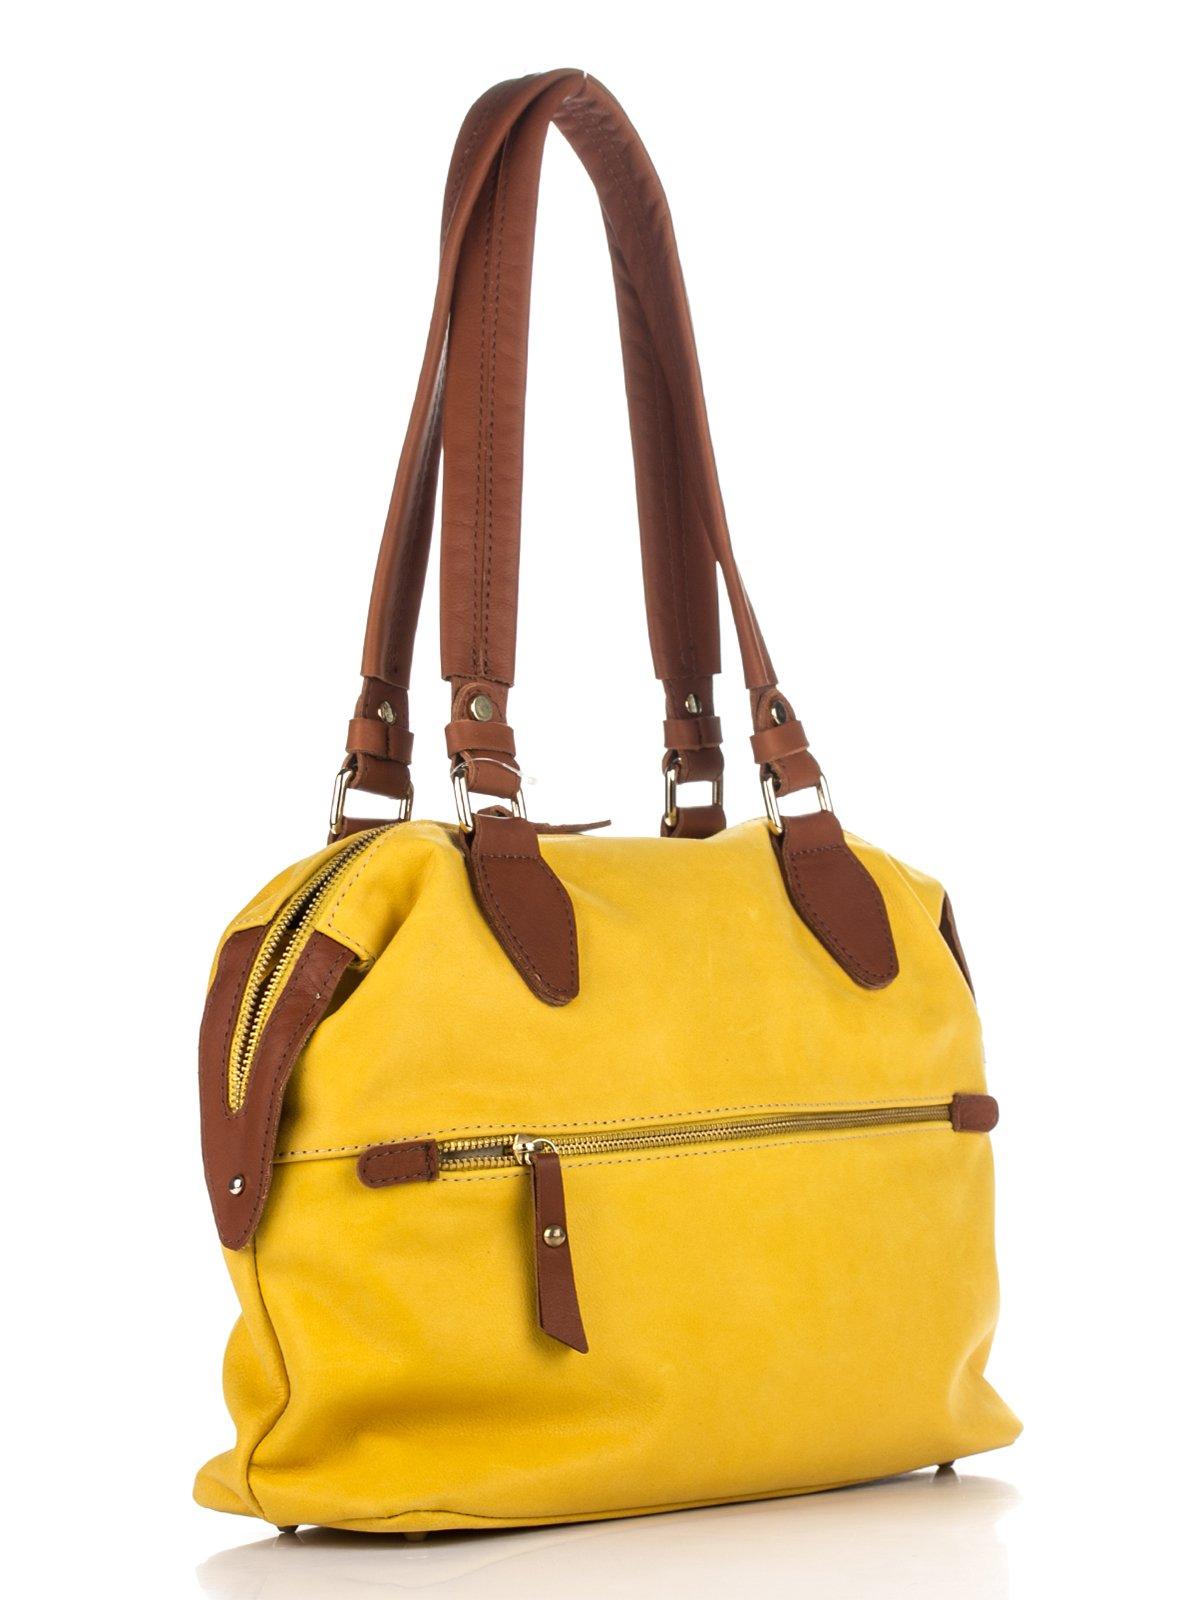 Сумка желто-коричневая | 3173305 | фото 3